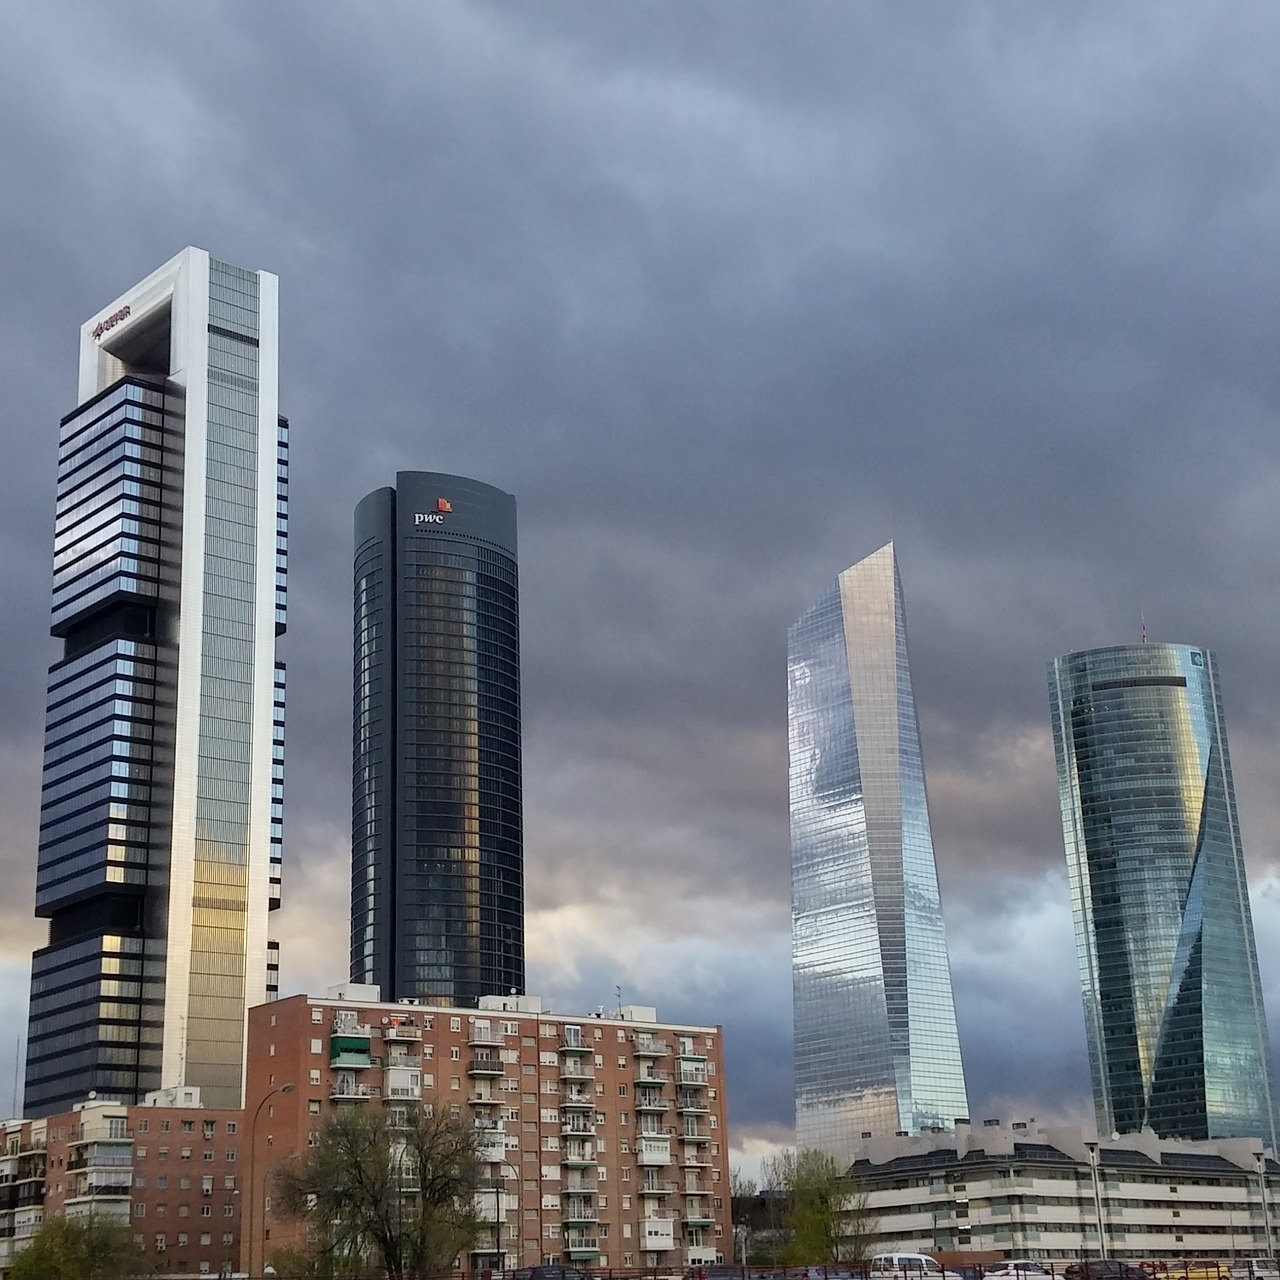 La arquitectura moderna de madrid meraviglia for La arquitectura en espana